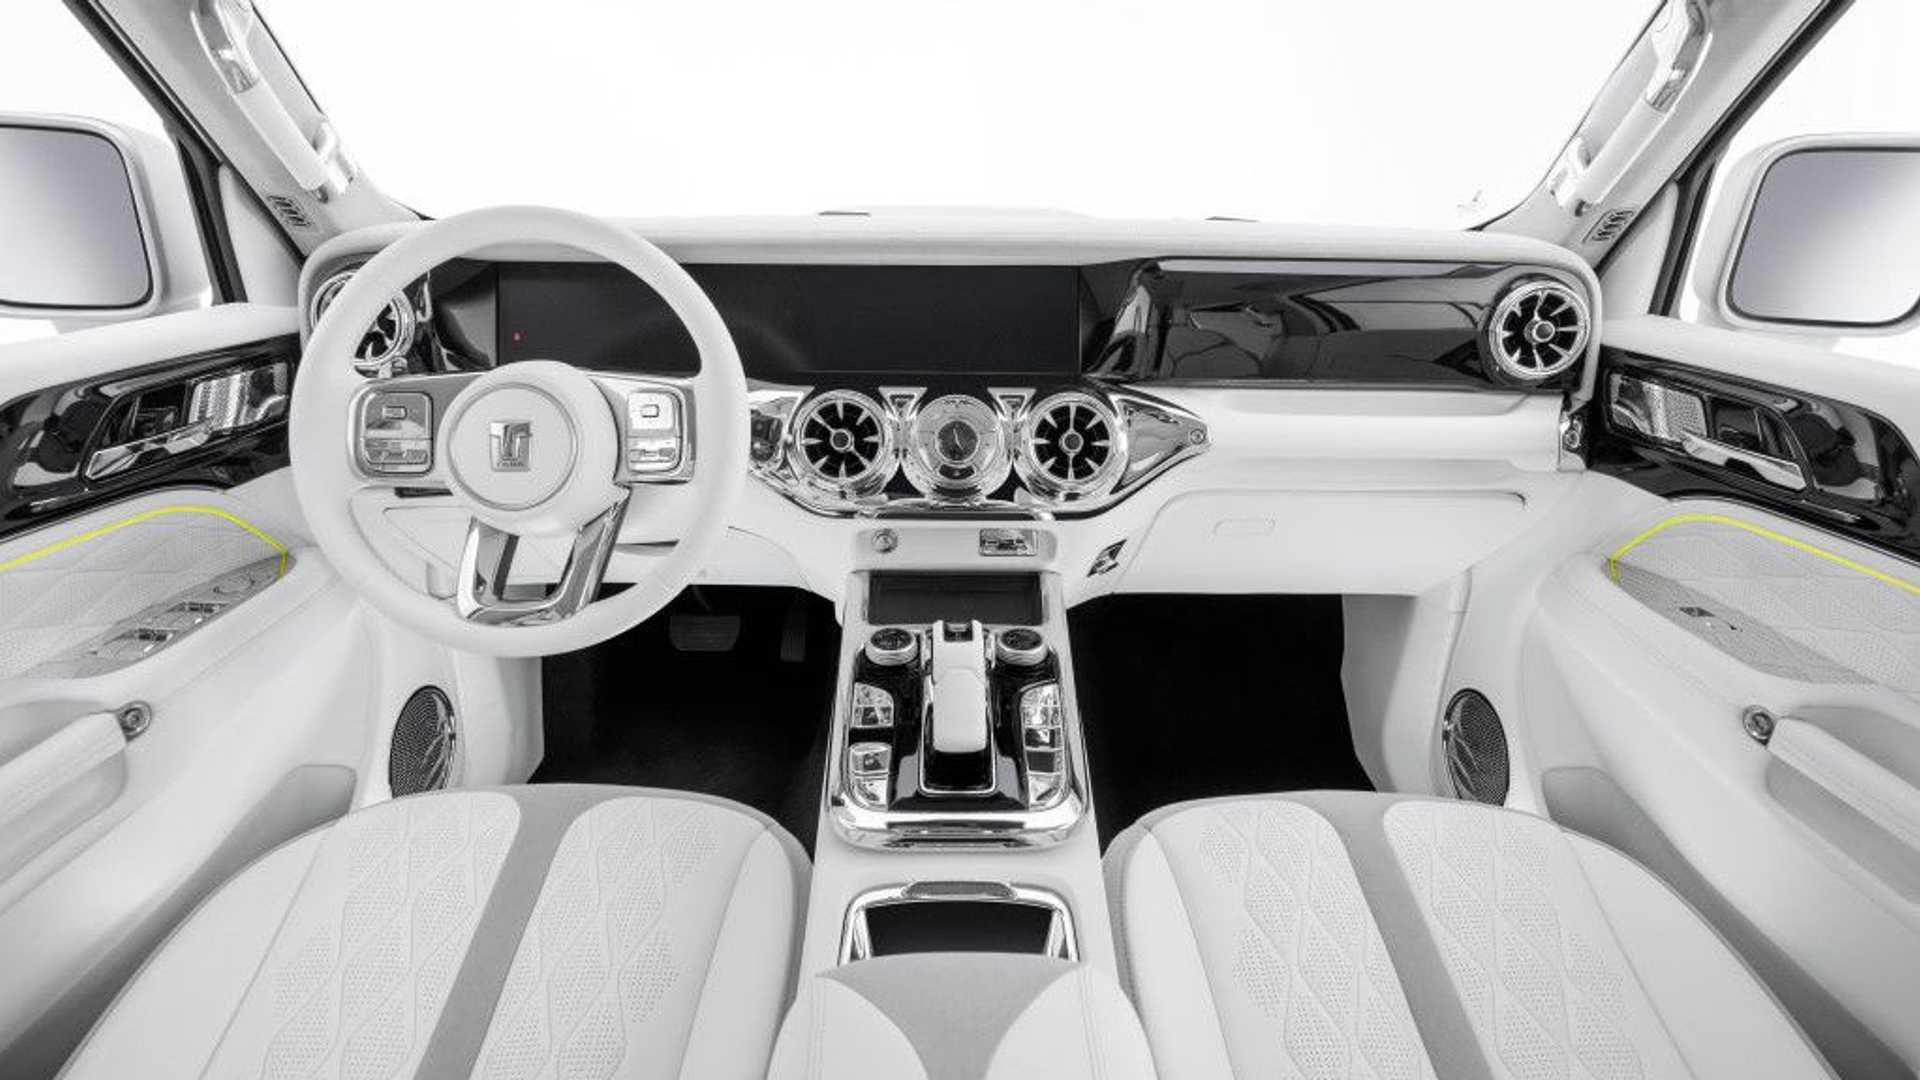 WEY Cyber Tank 300 Concept interior